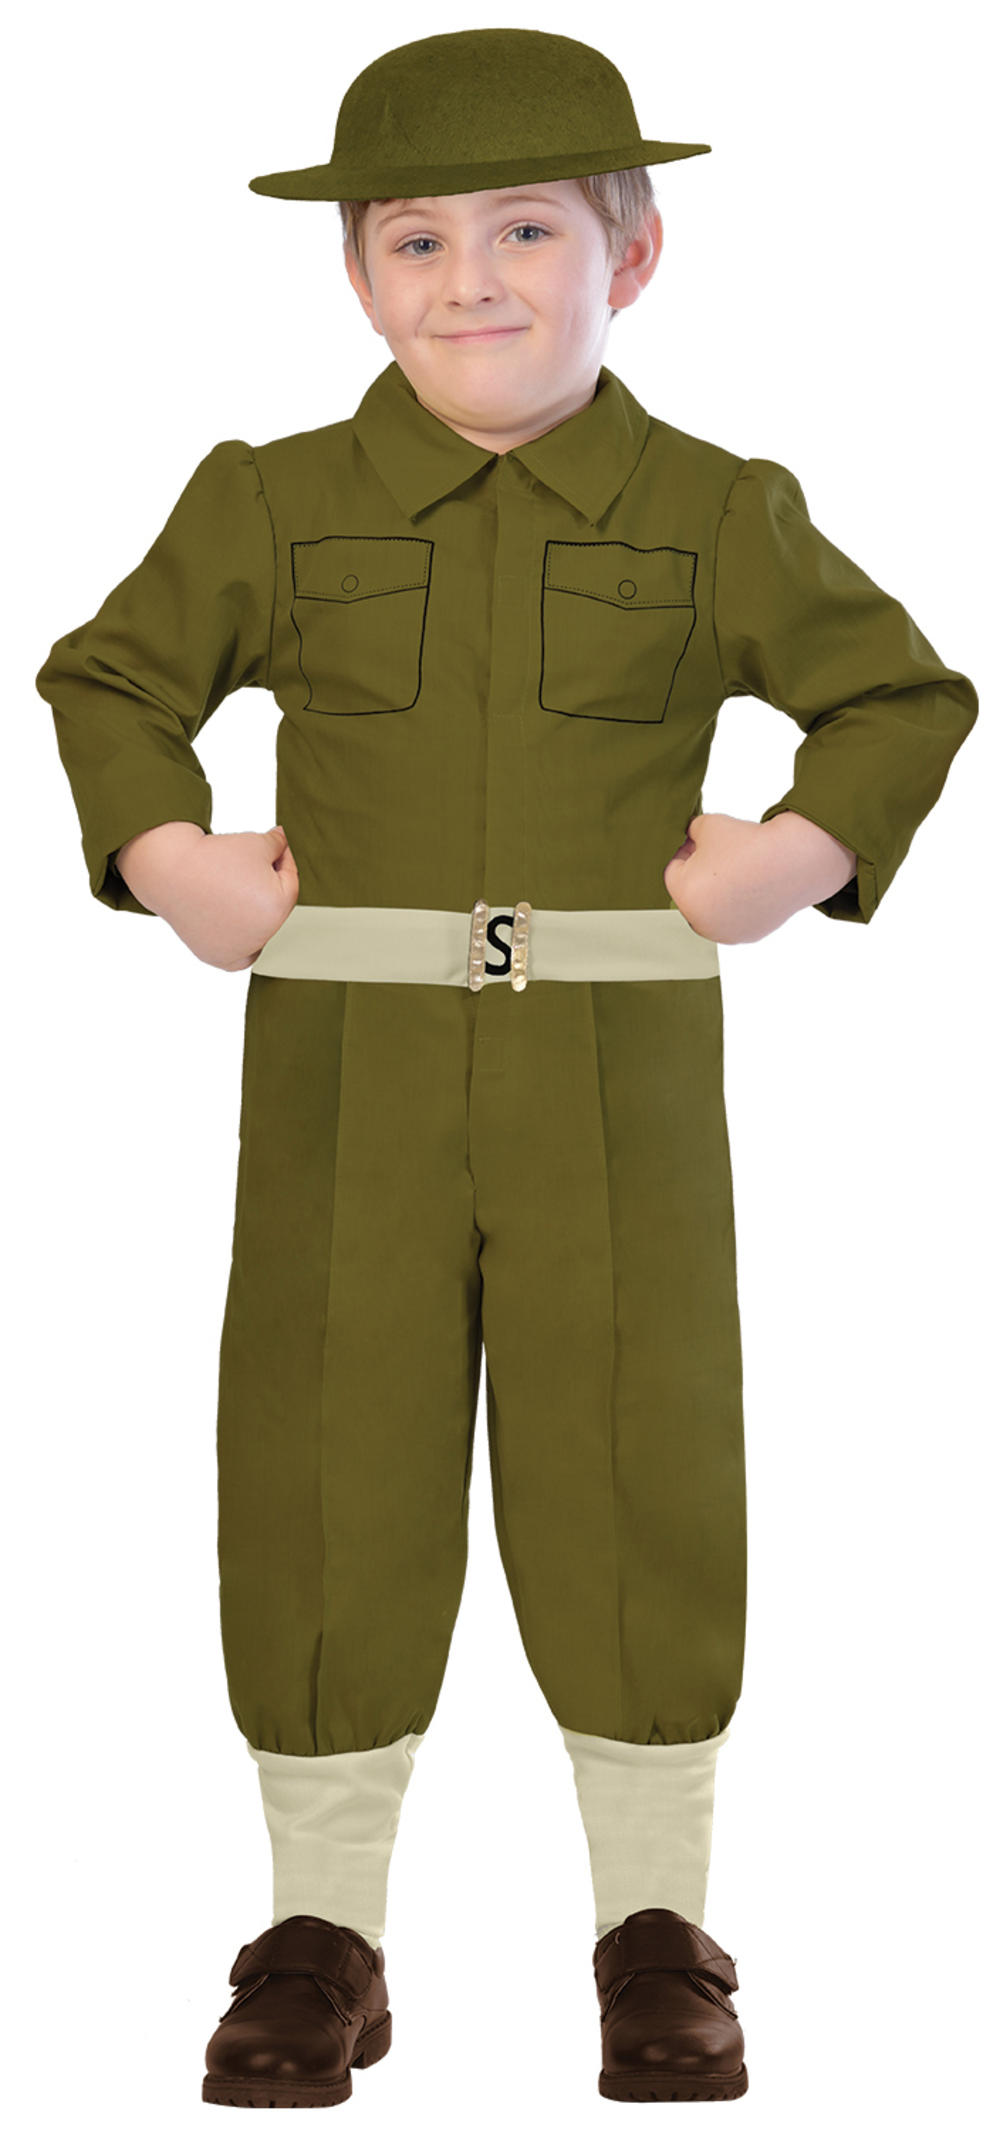 WW1 Soldier Boys Fancy Dress Military Army Wartime 1910s Kids Childrens Costume